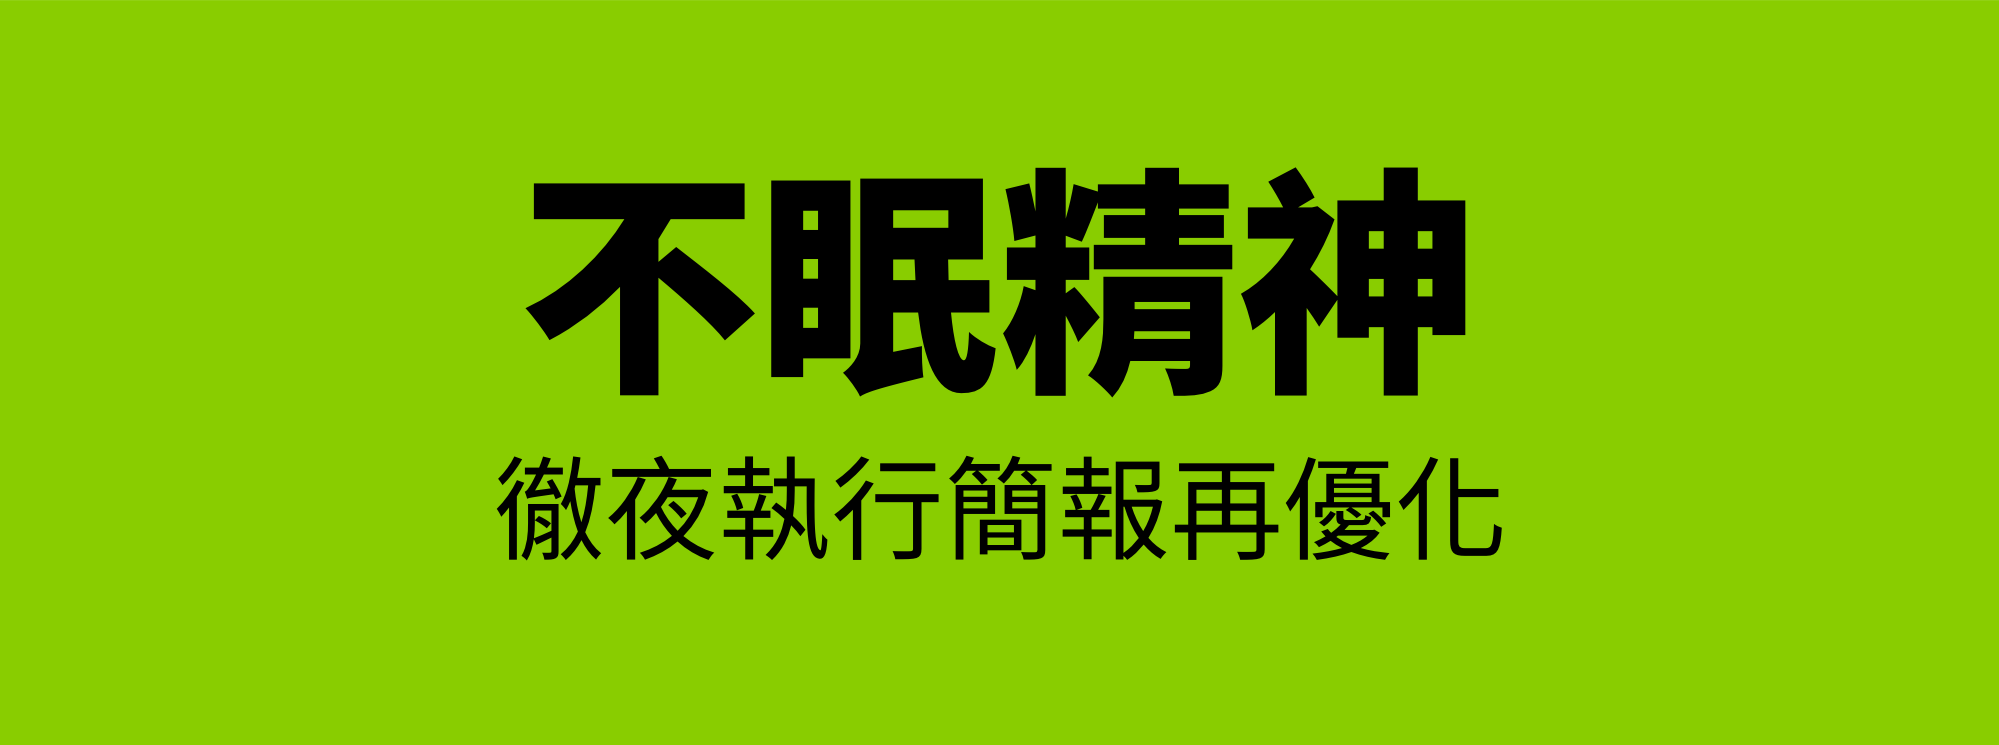 May.19 l 不眠精神.png